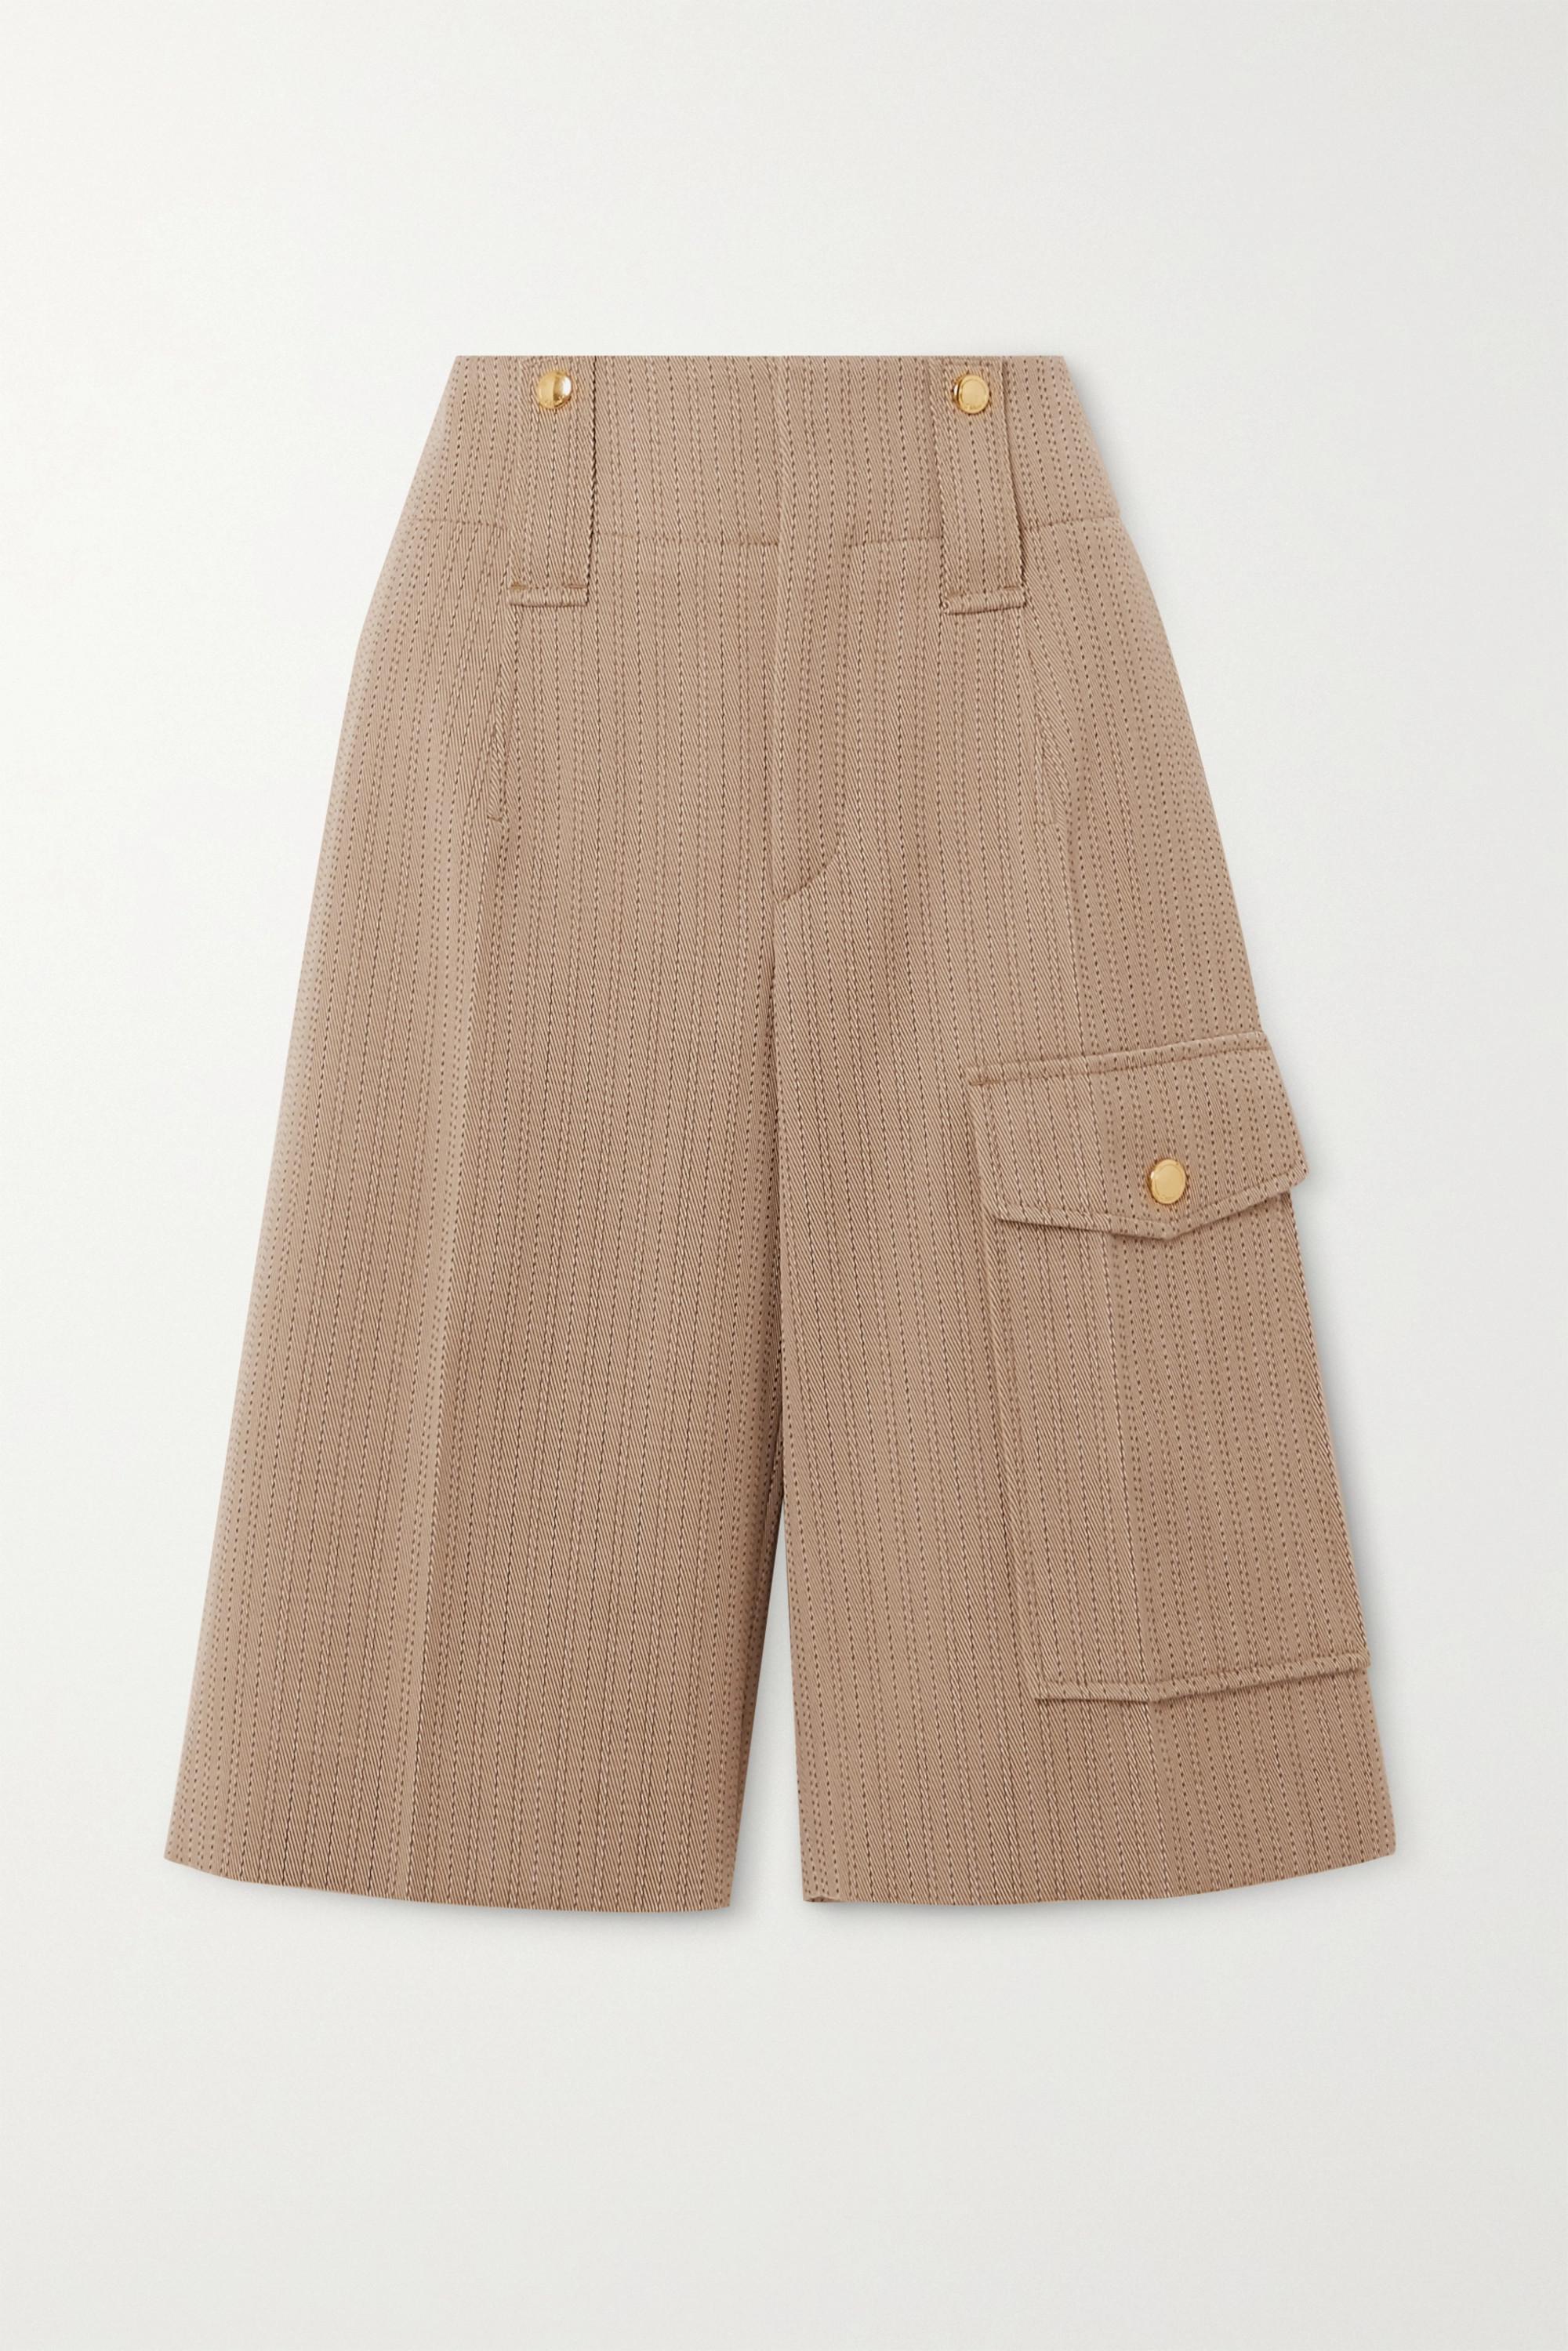 Chloé Pinstriped wool-twill shorts